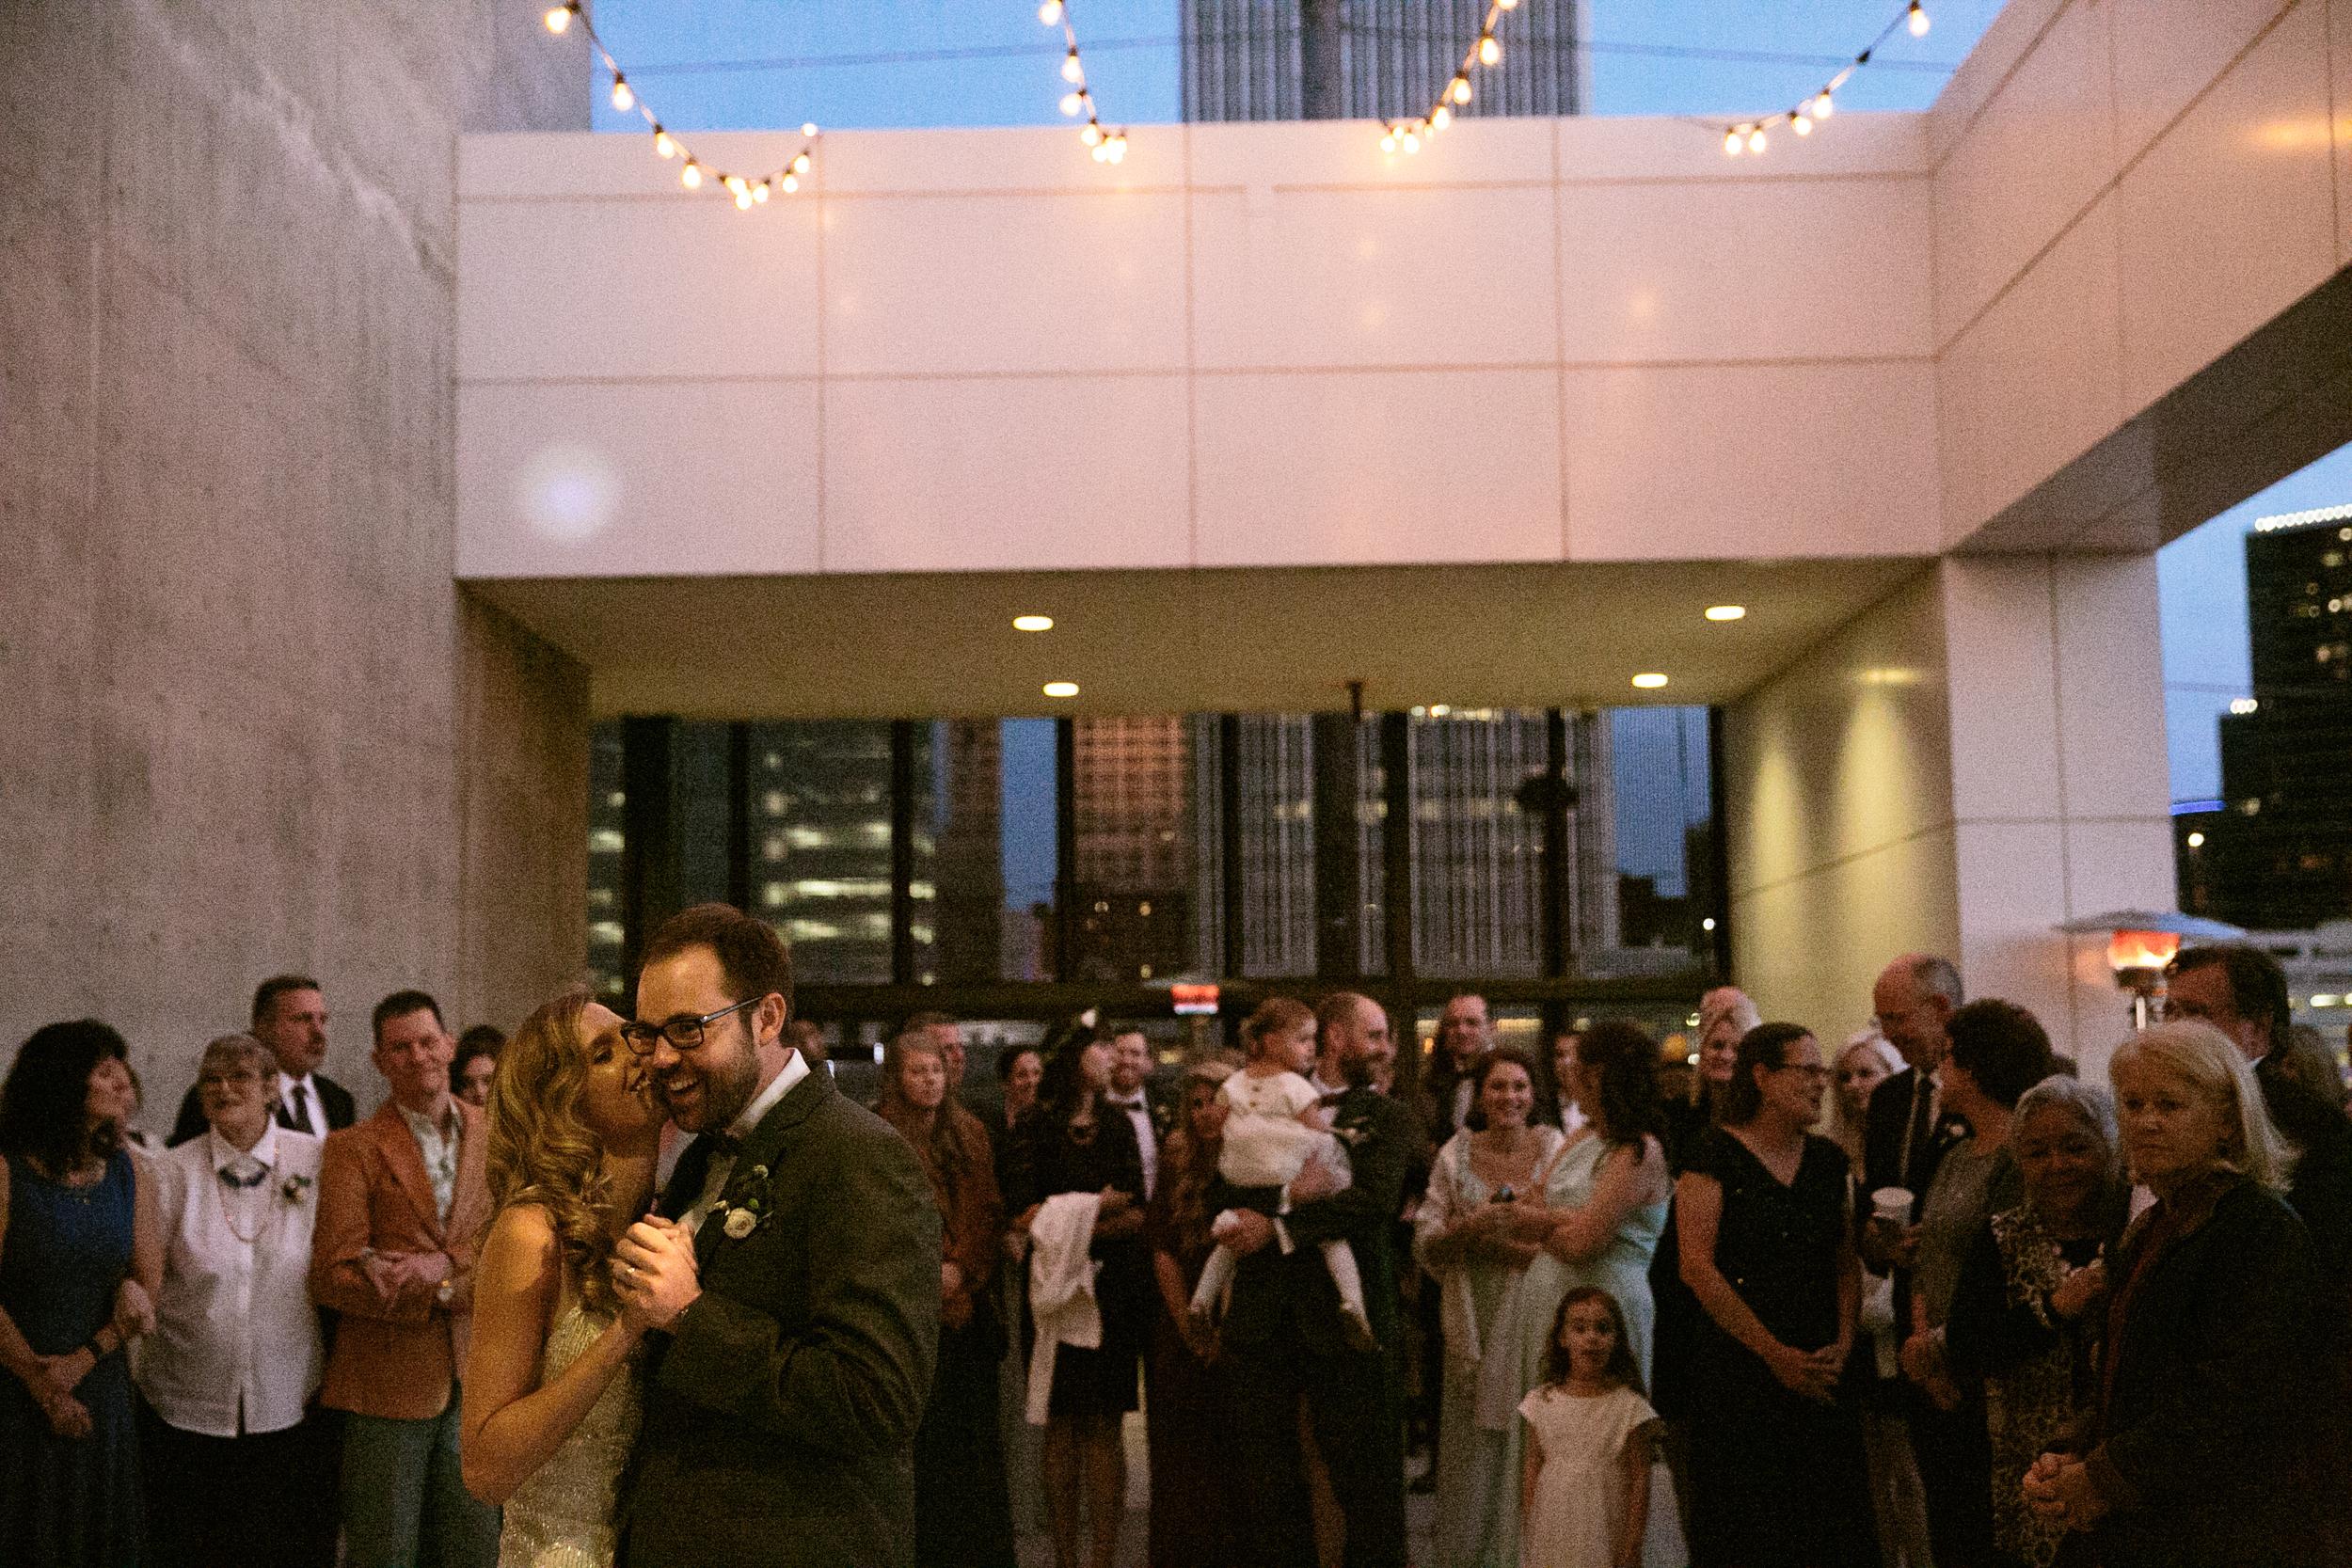 tulsa_oklahoma_wedding-140.jpg